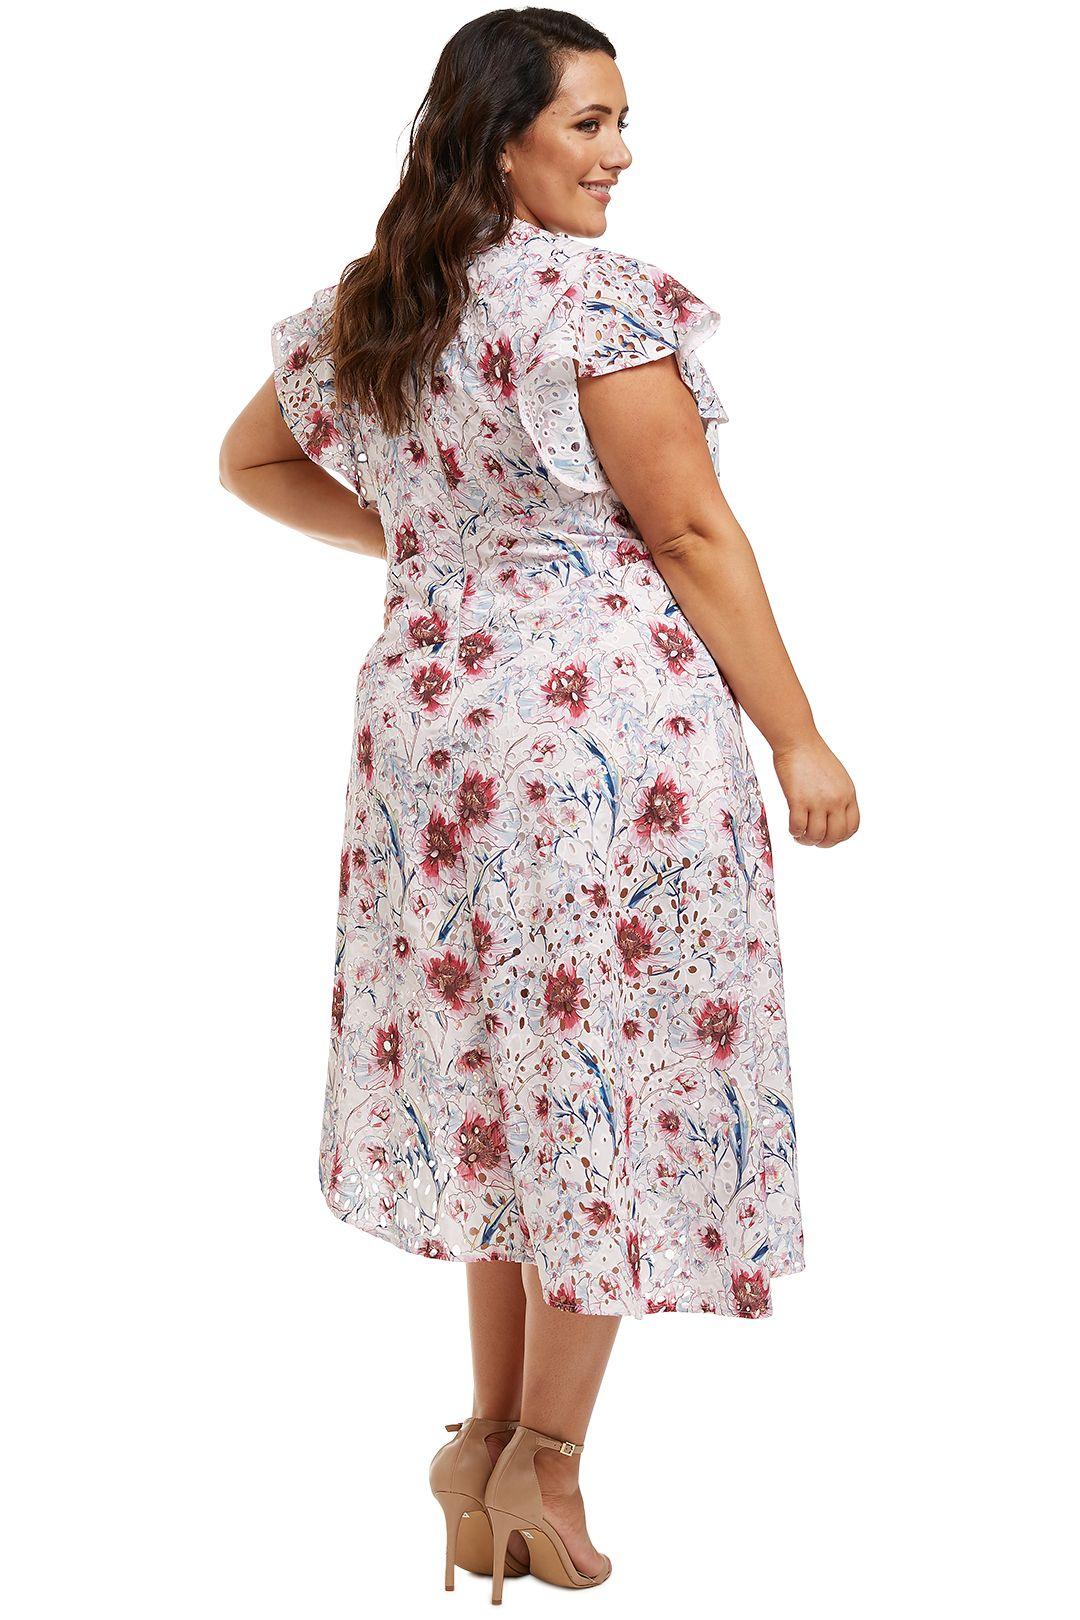 Talulah-Bonita-Midi-Dress-Casablanca-Print-Back